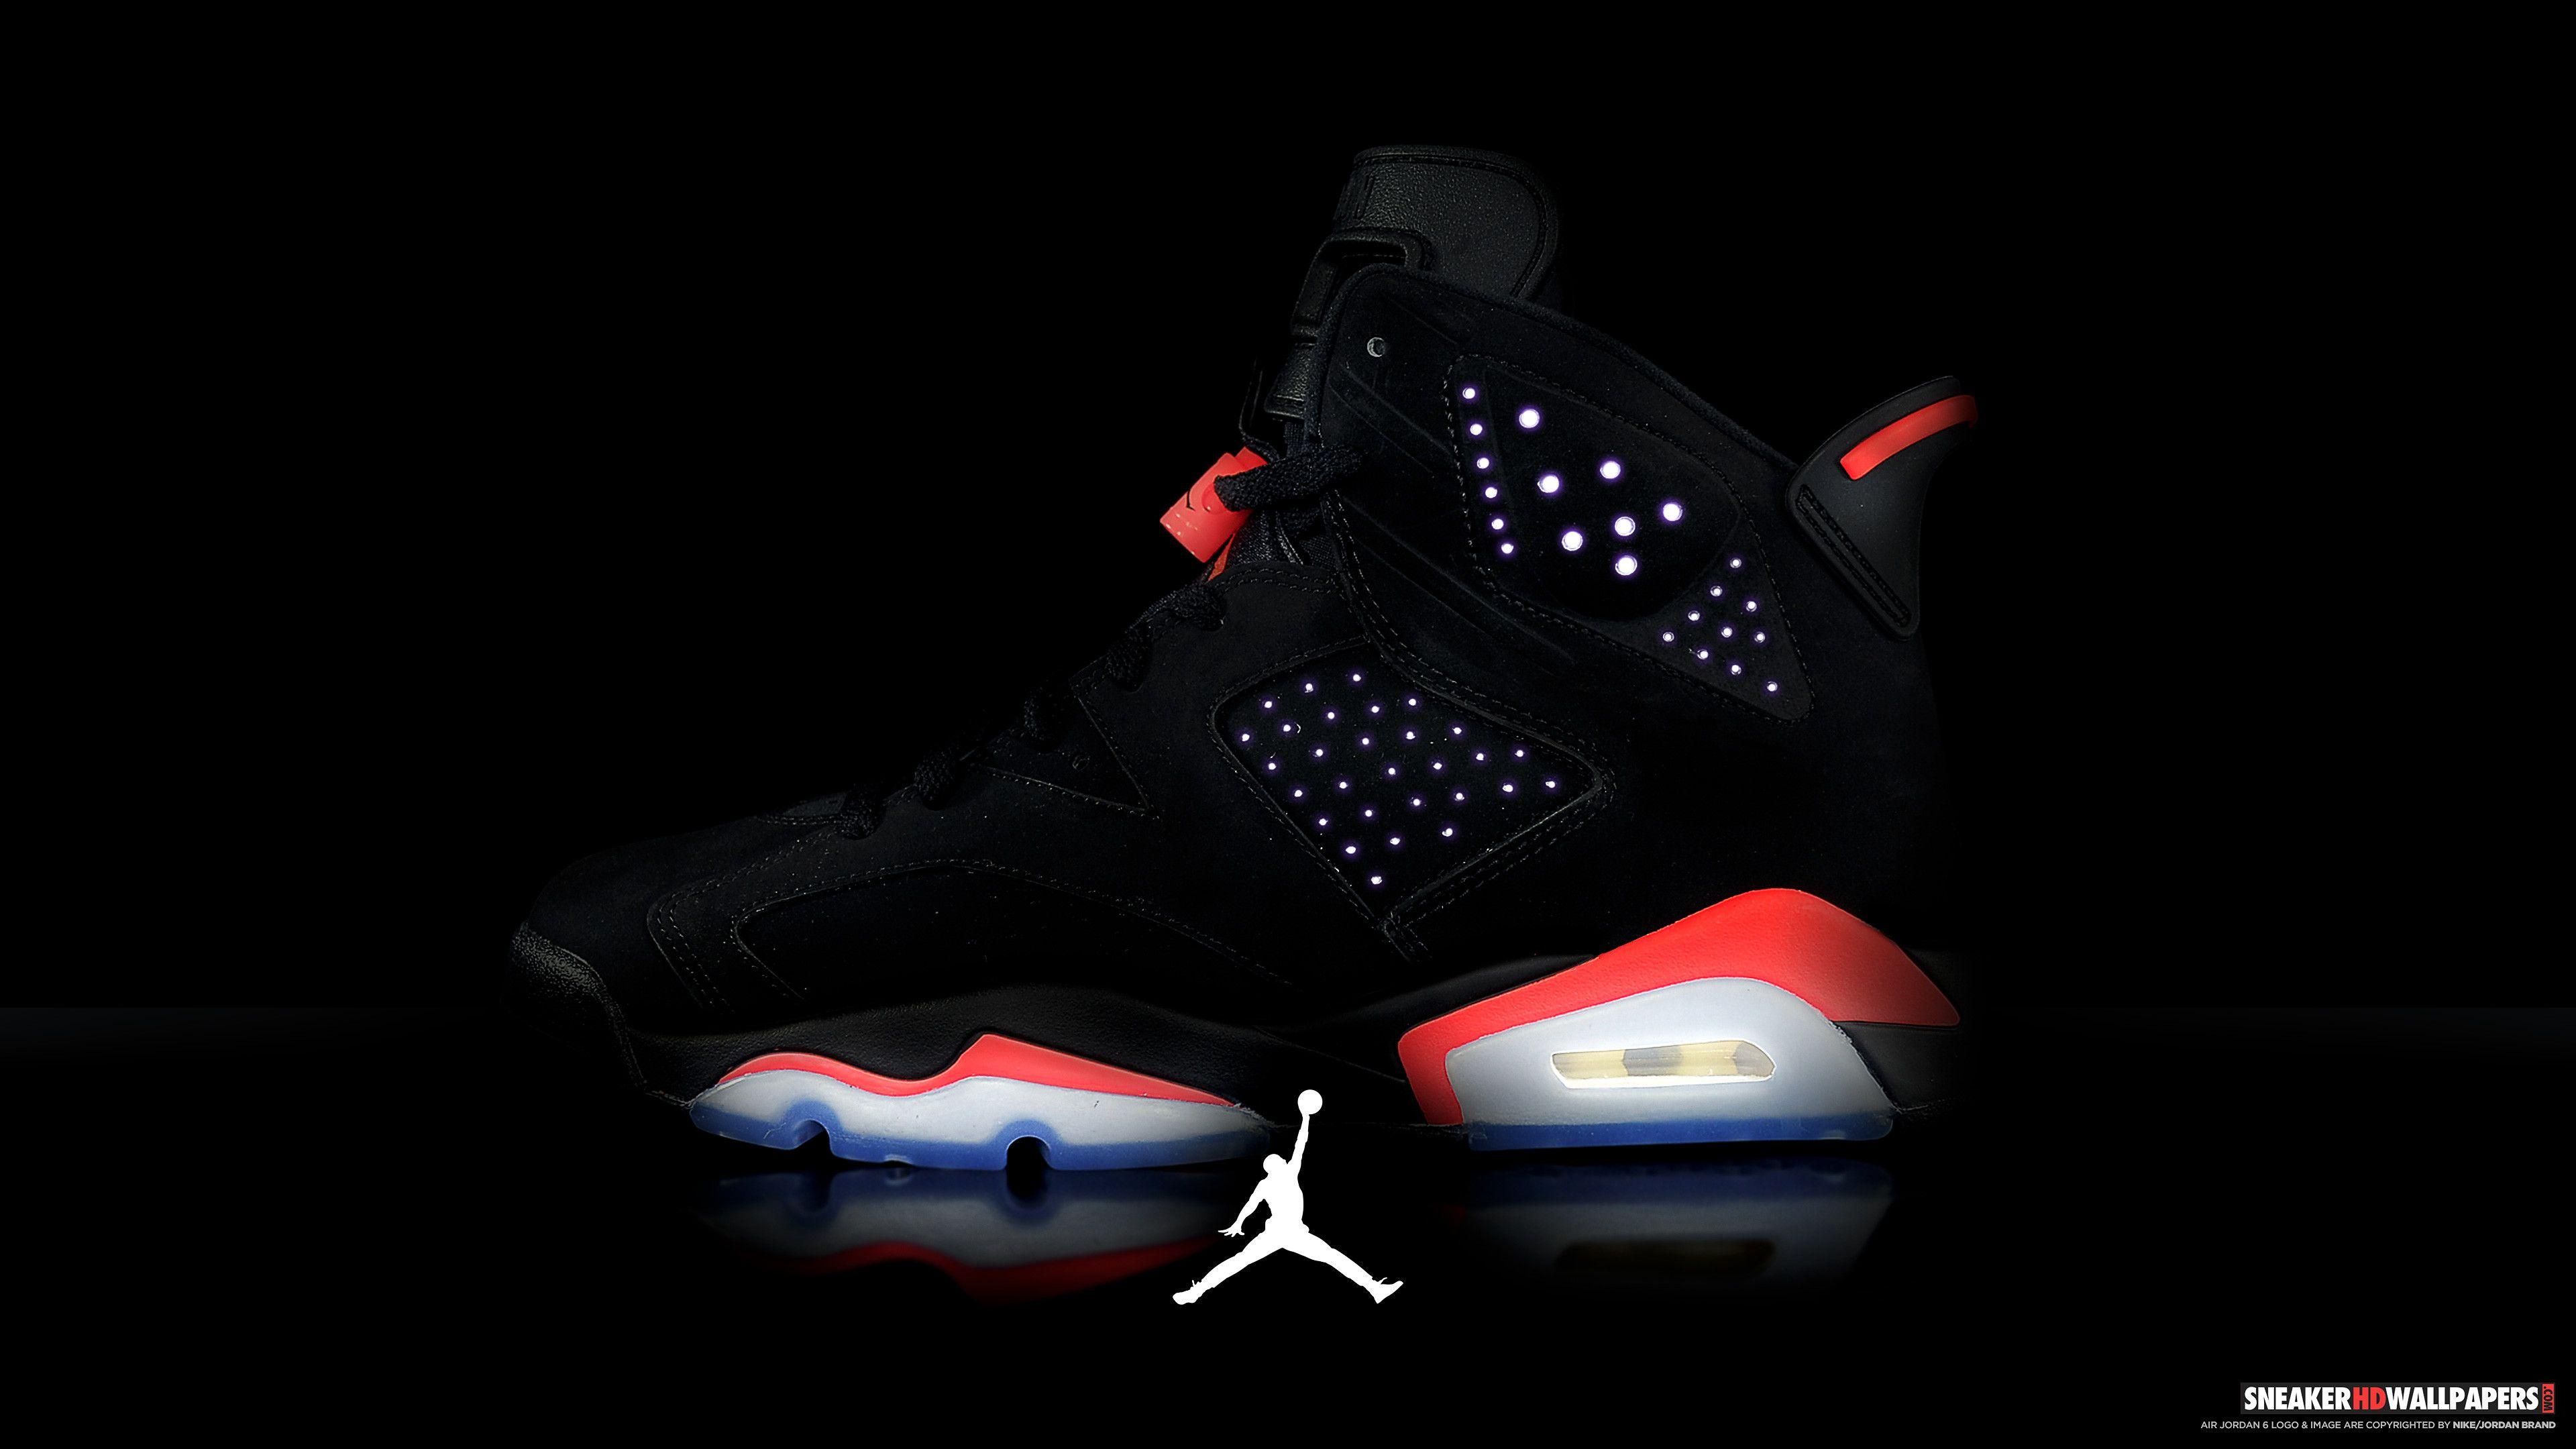 Retro Air Jordan Shoes Wallpapers On